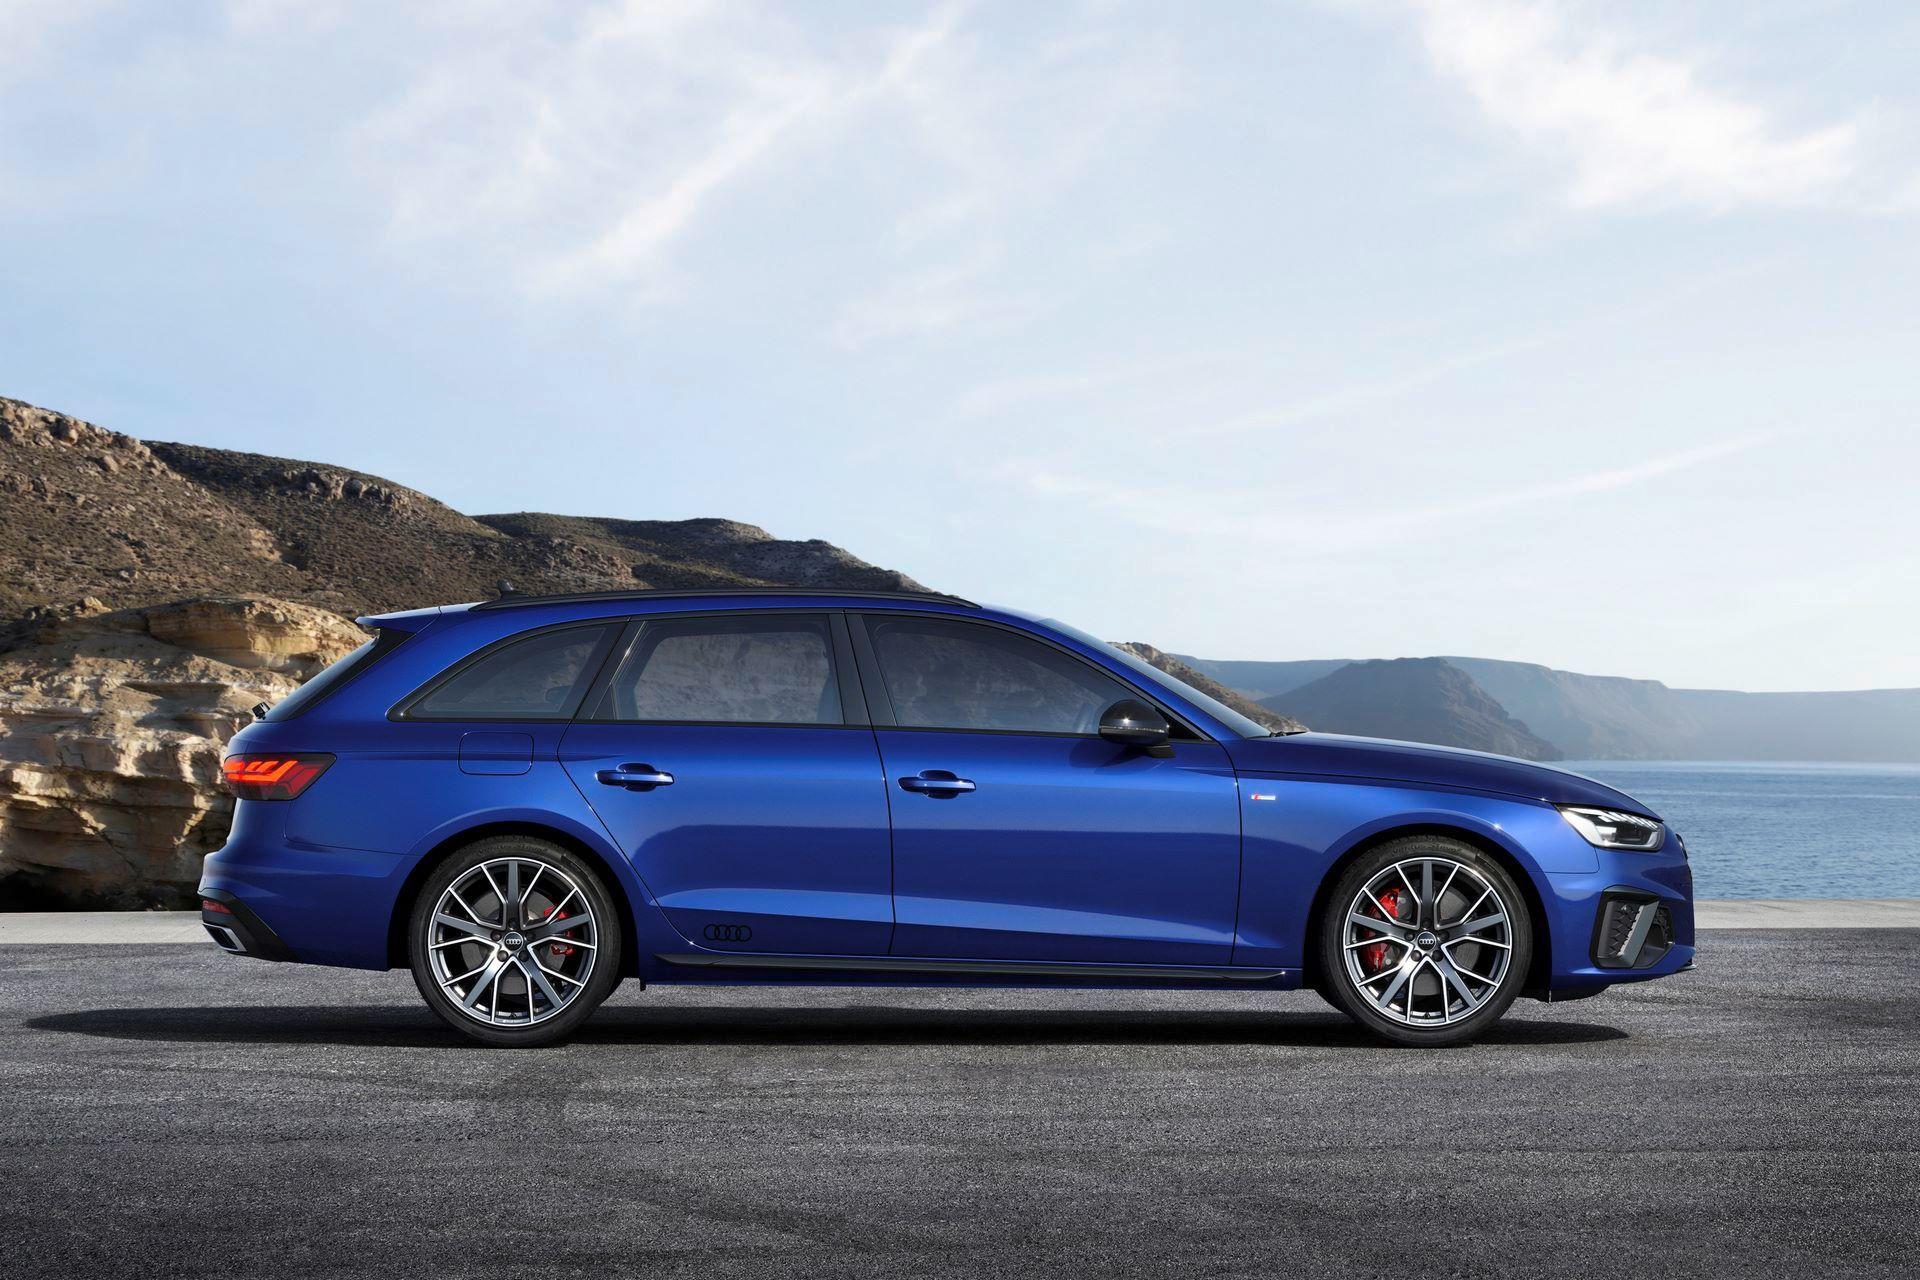 Audi-A4-A5-Q7-Q8-Competition-And-Competition-Plus-Trims-50